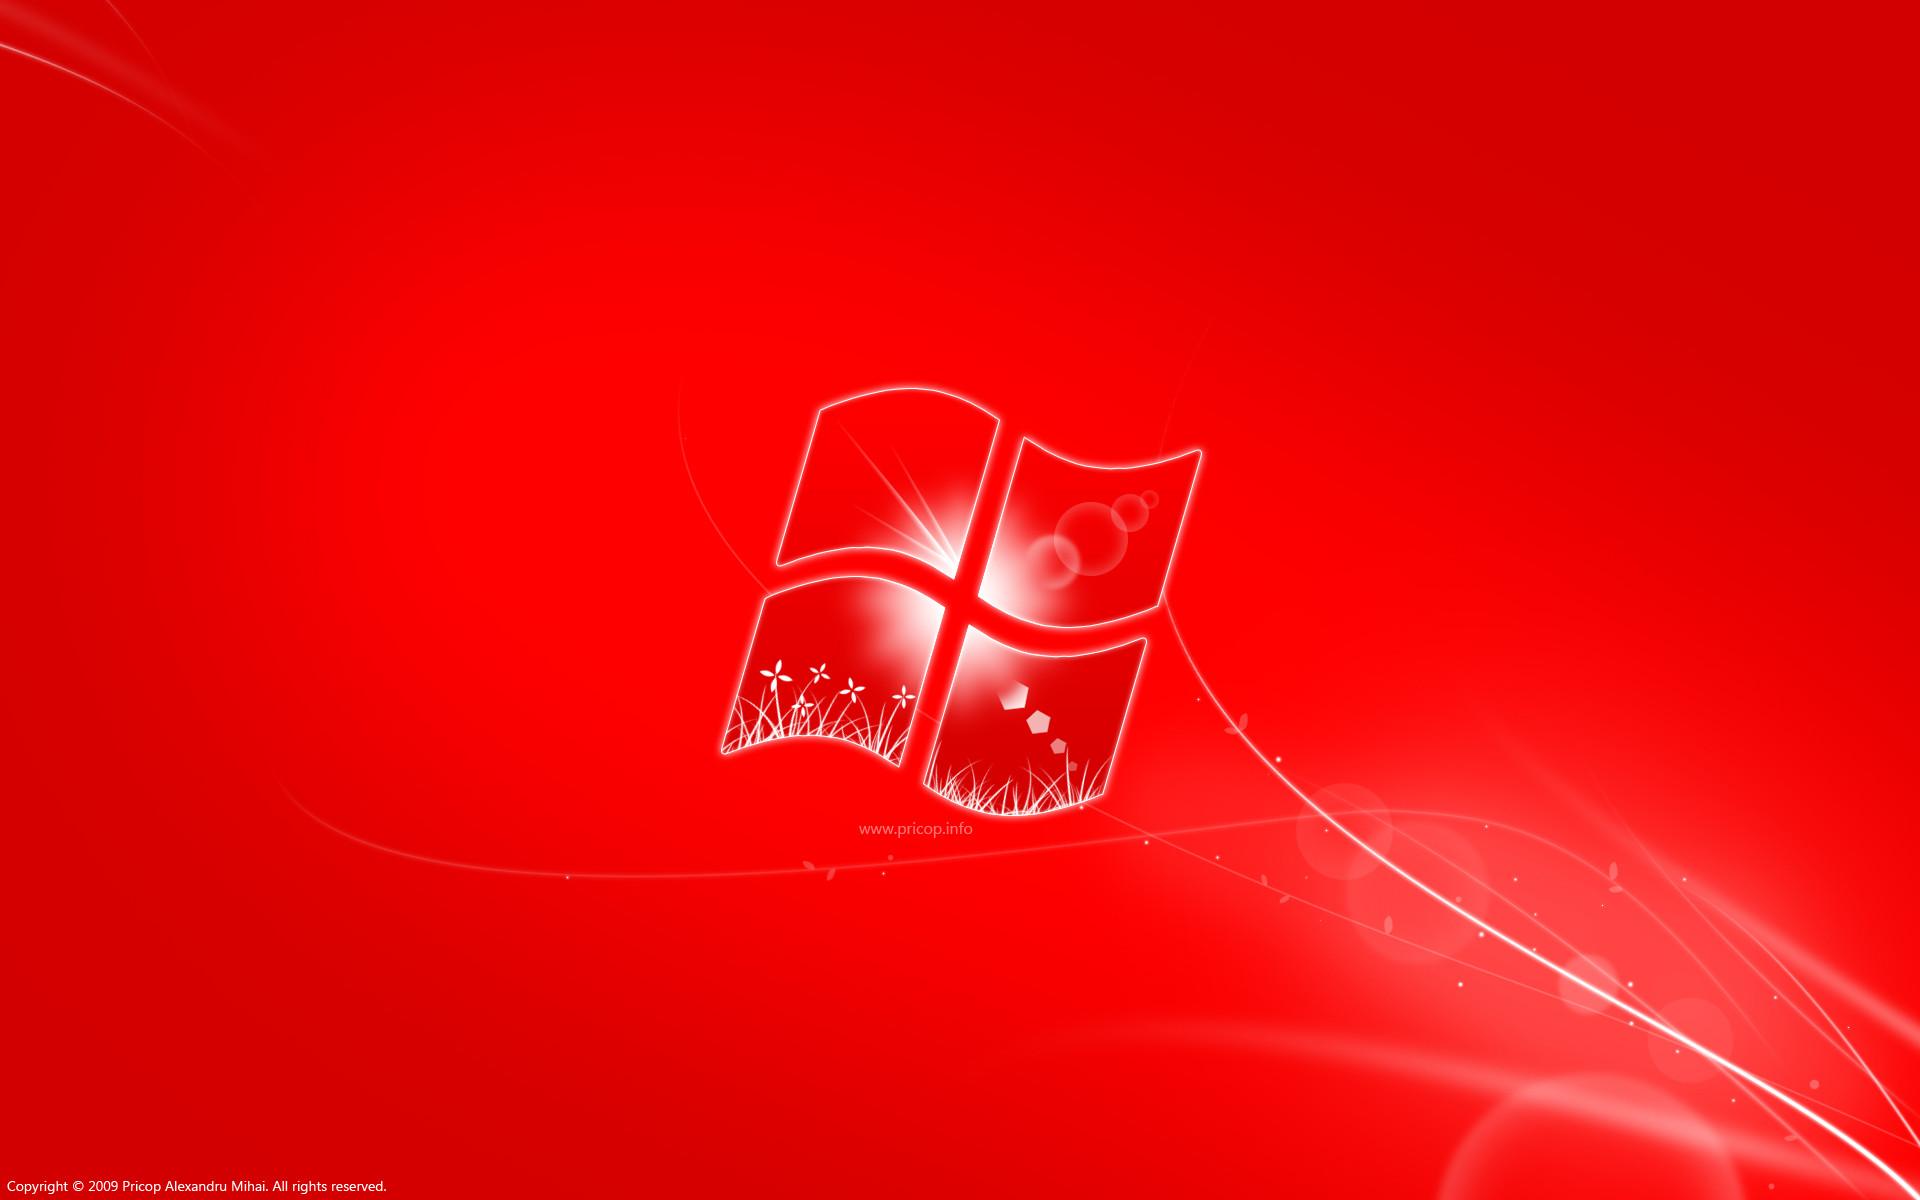 Windows Red Pricop